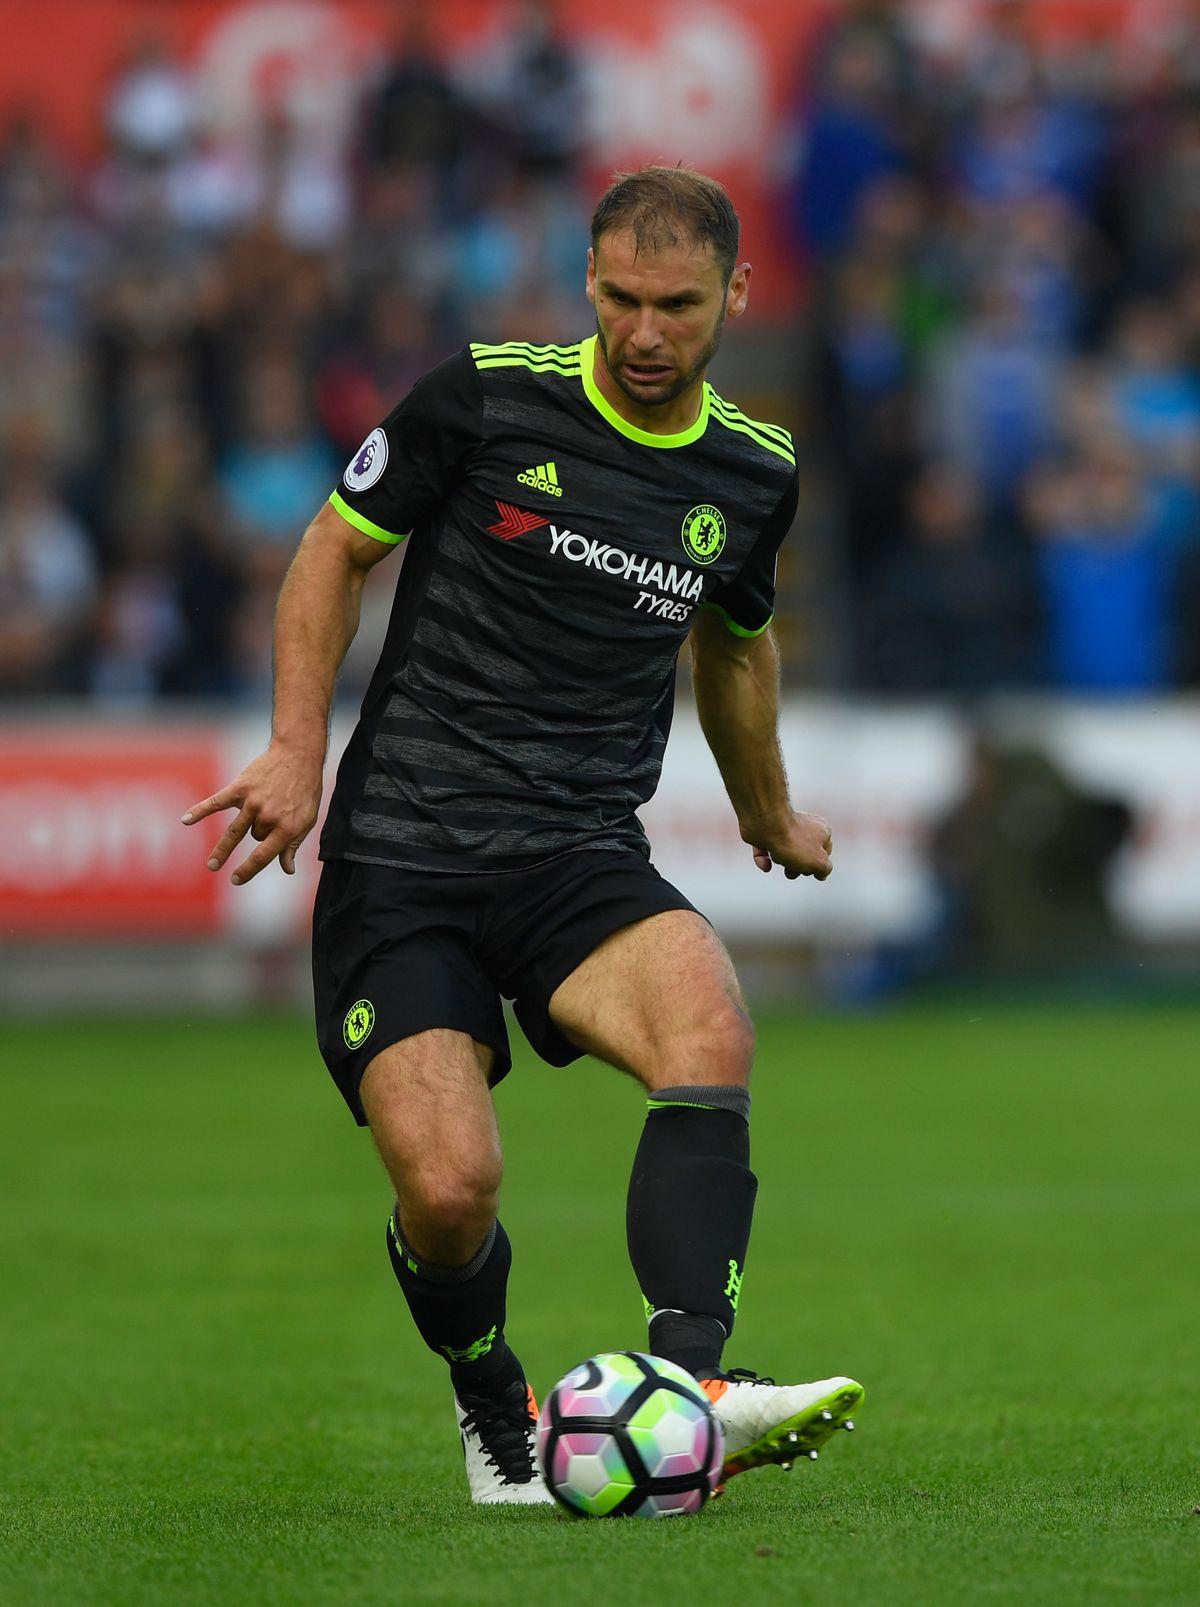 Swansea City v Chelsea - Premier League